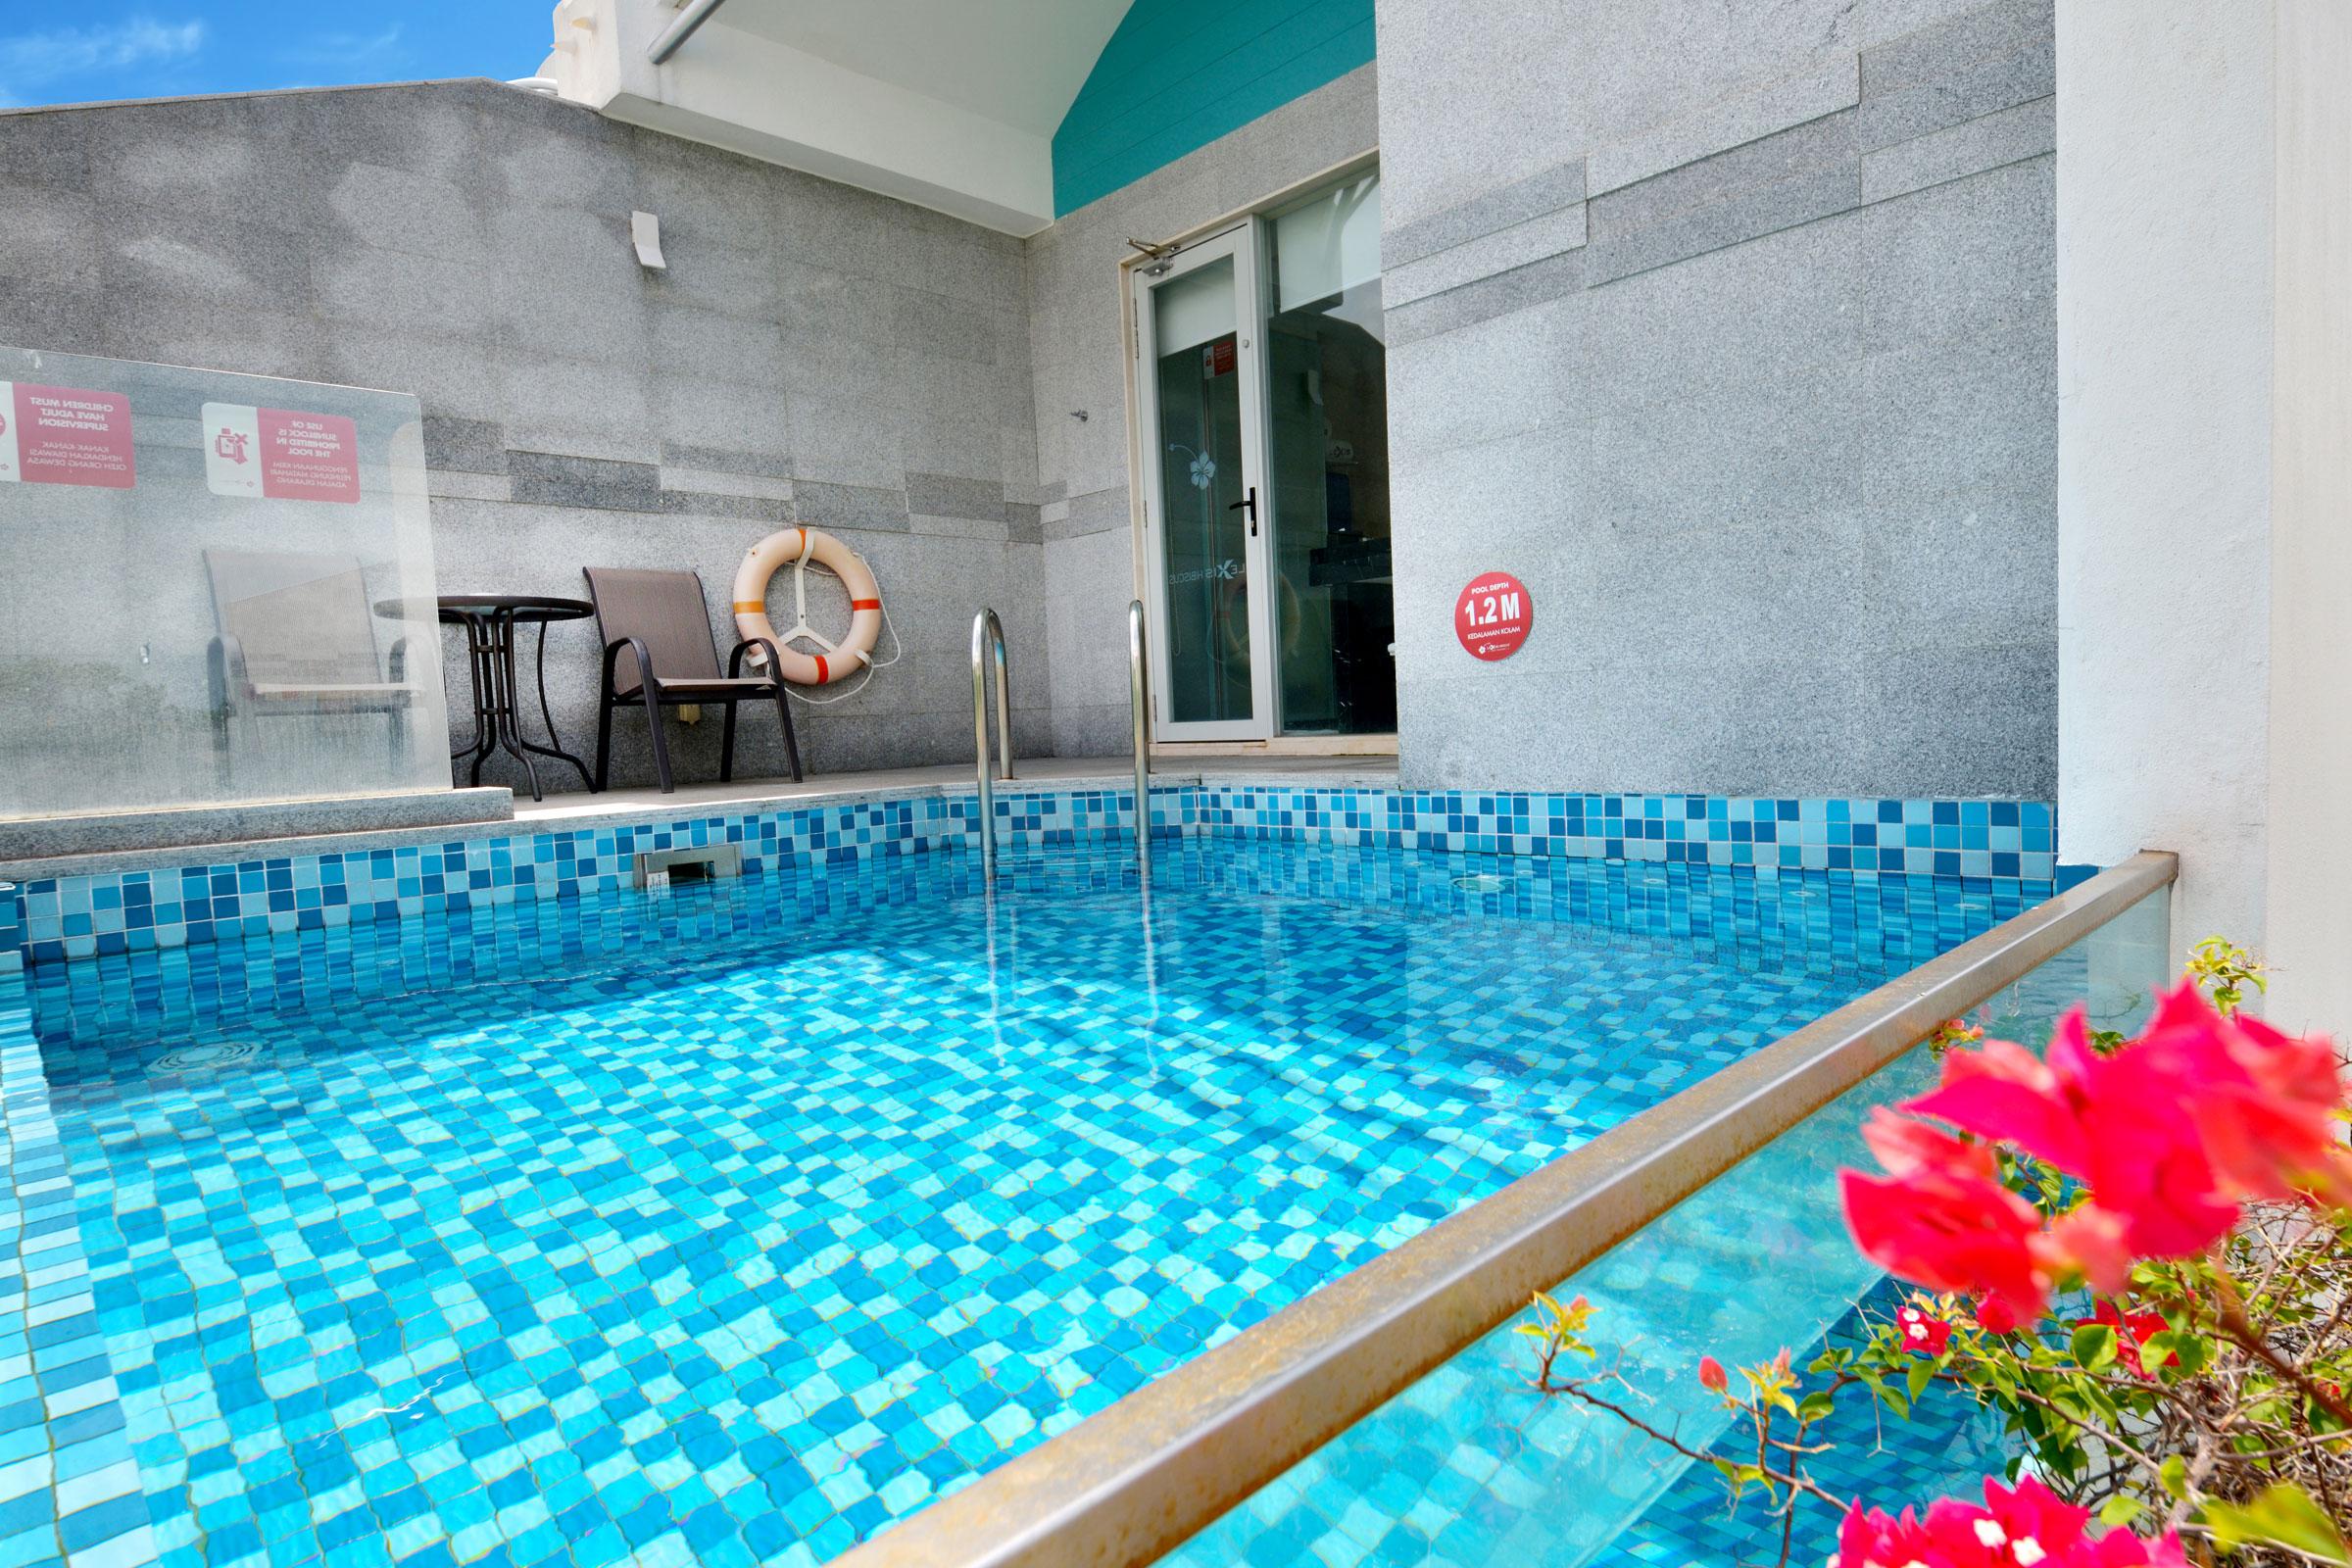 Executive Pool Villa - Pool View.jpg